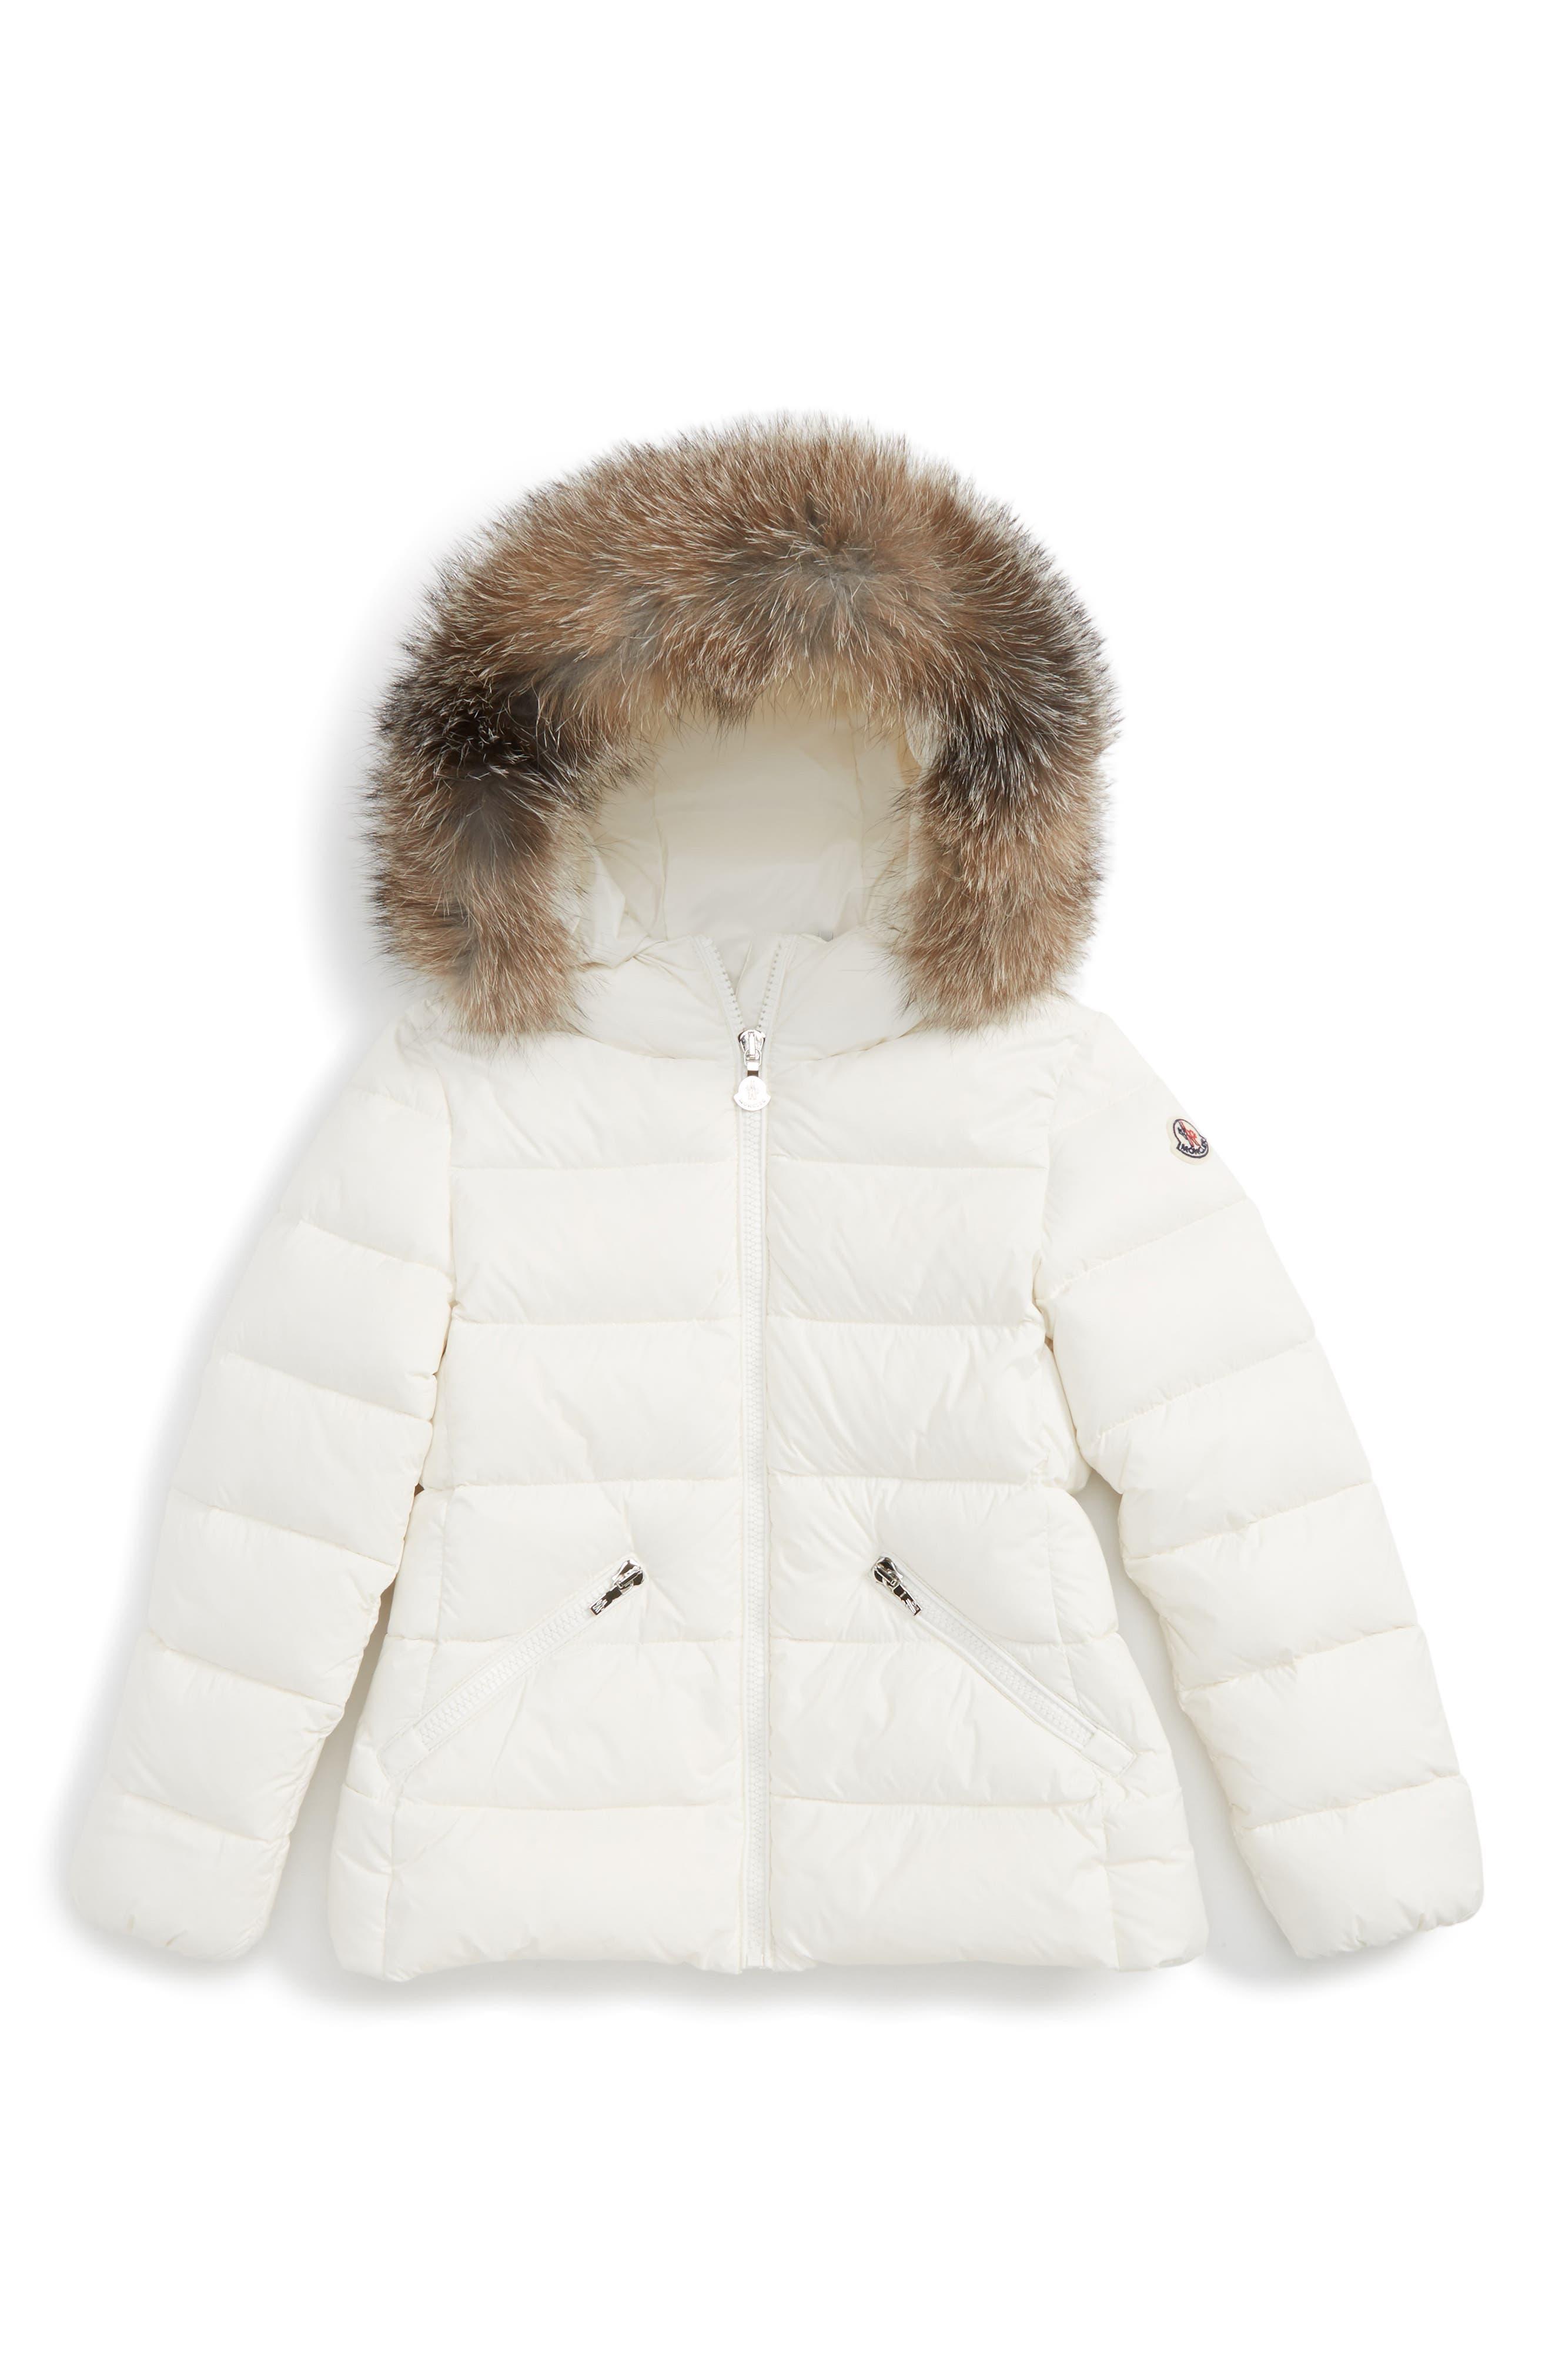 Aimeet Hooded Down Jacket with Genuine Fox Fur,                         Main,                         color, 101